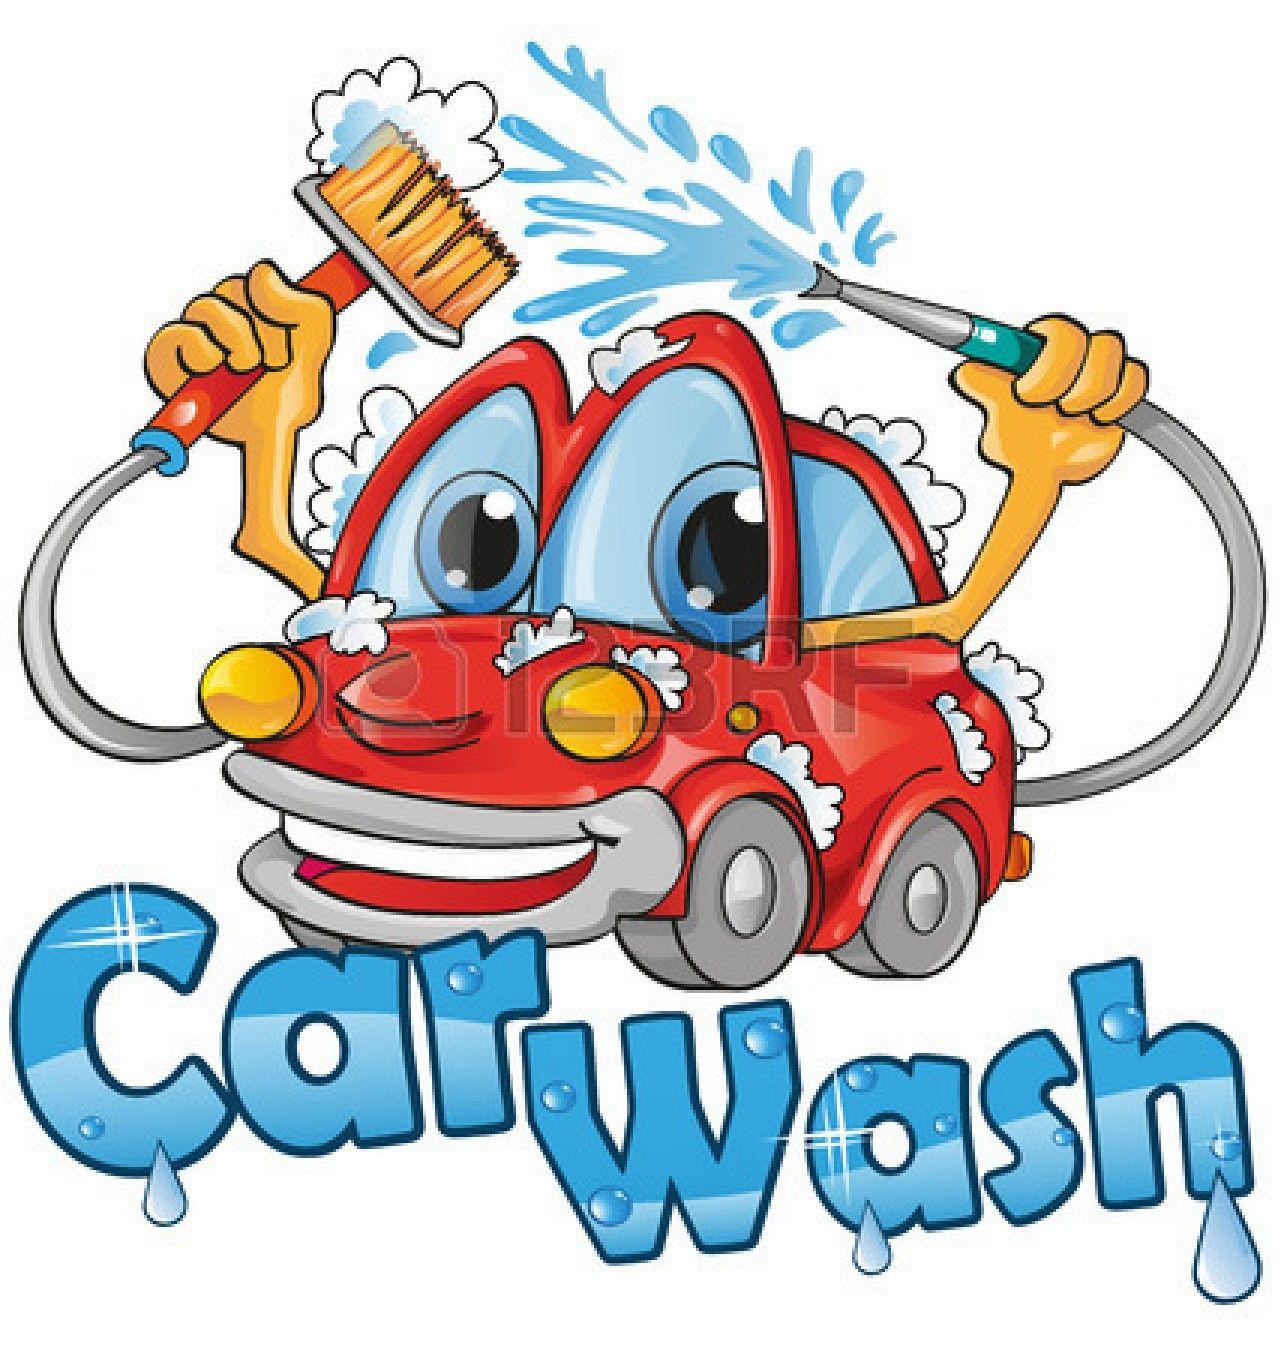 Car wash fundraiser car wash fundraiser clipart car wash